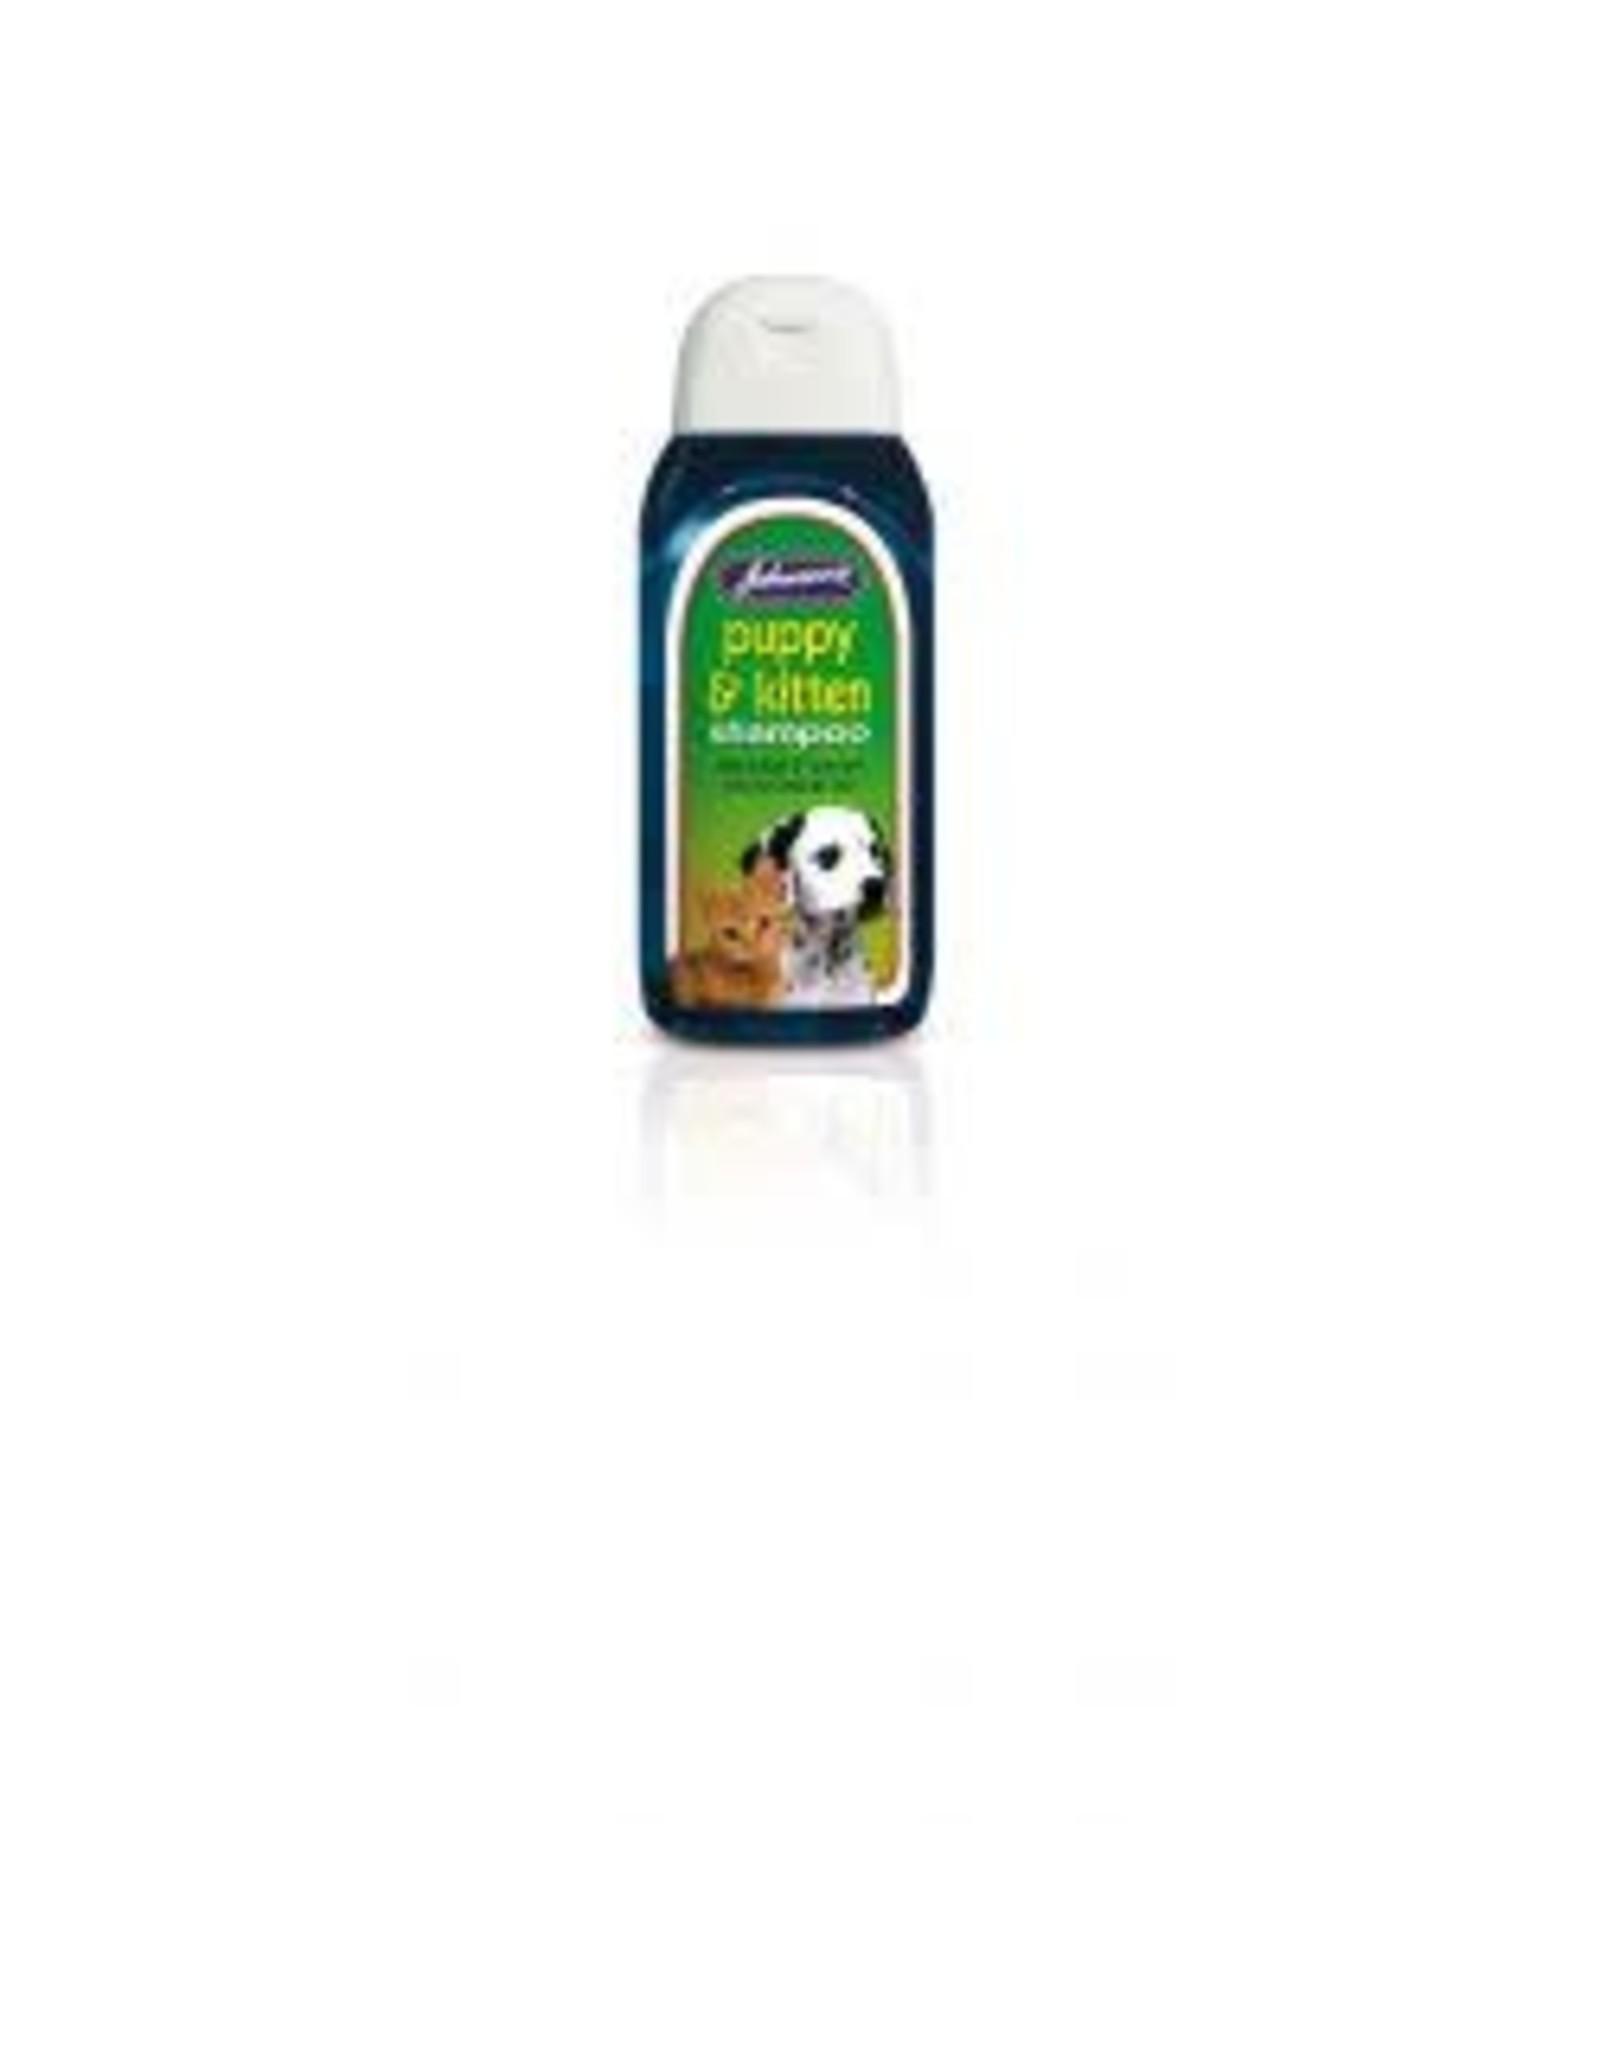 Johnsons Veterinary Products Johnsons Puppy & Kitten Shampoo 200ml